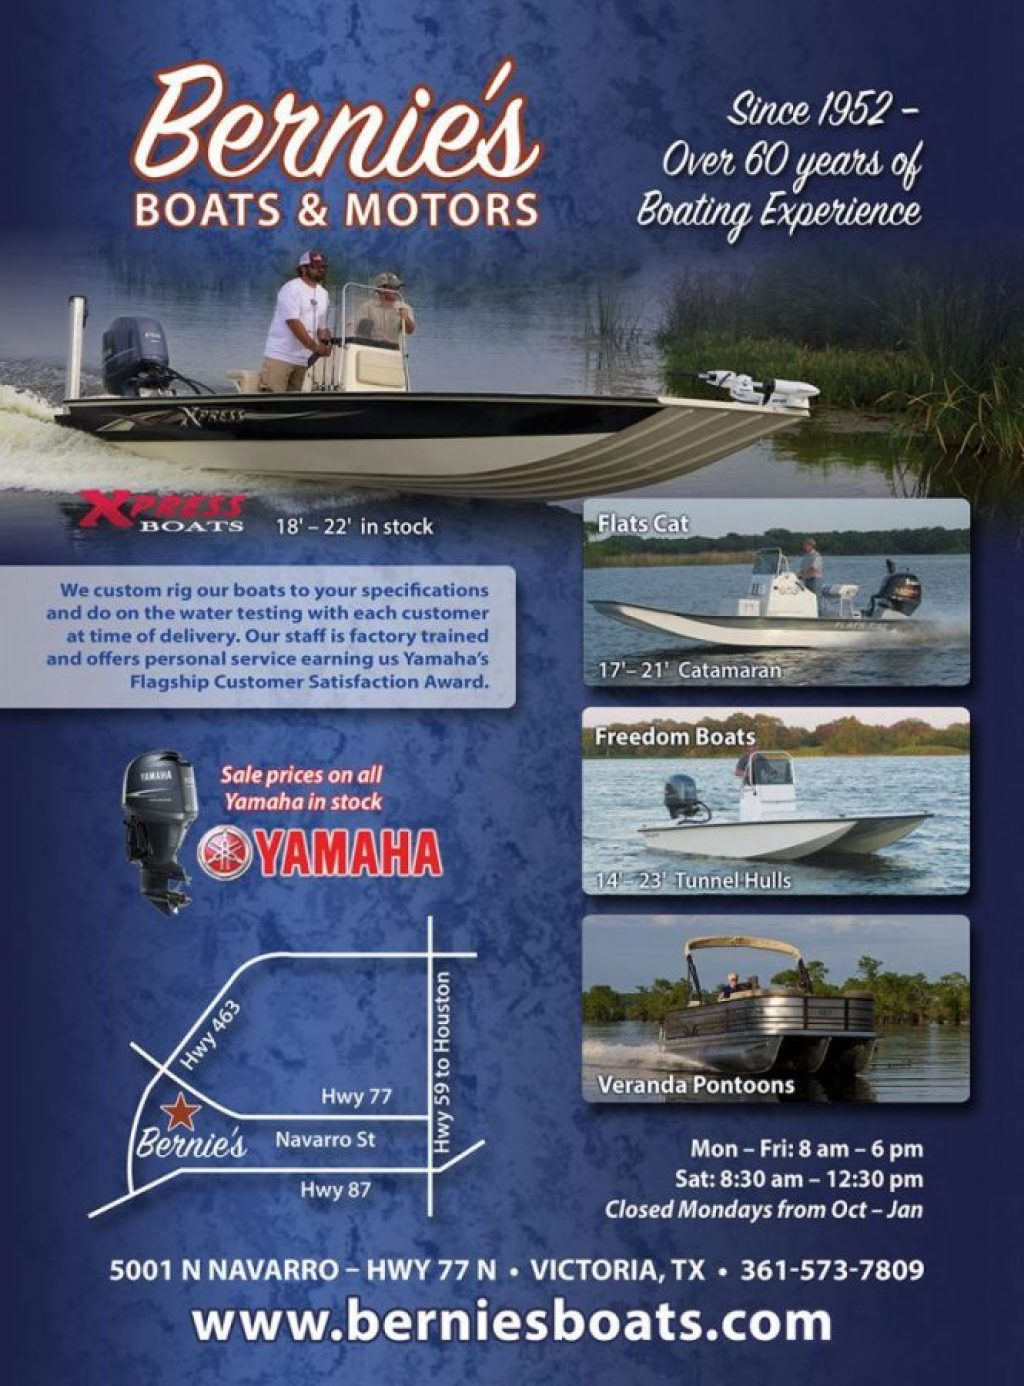 Bernies Boats